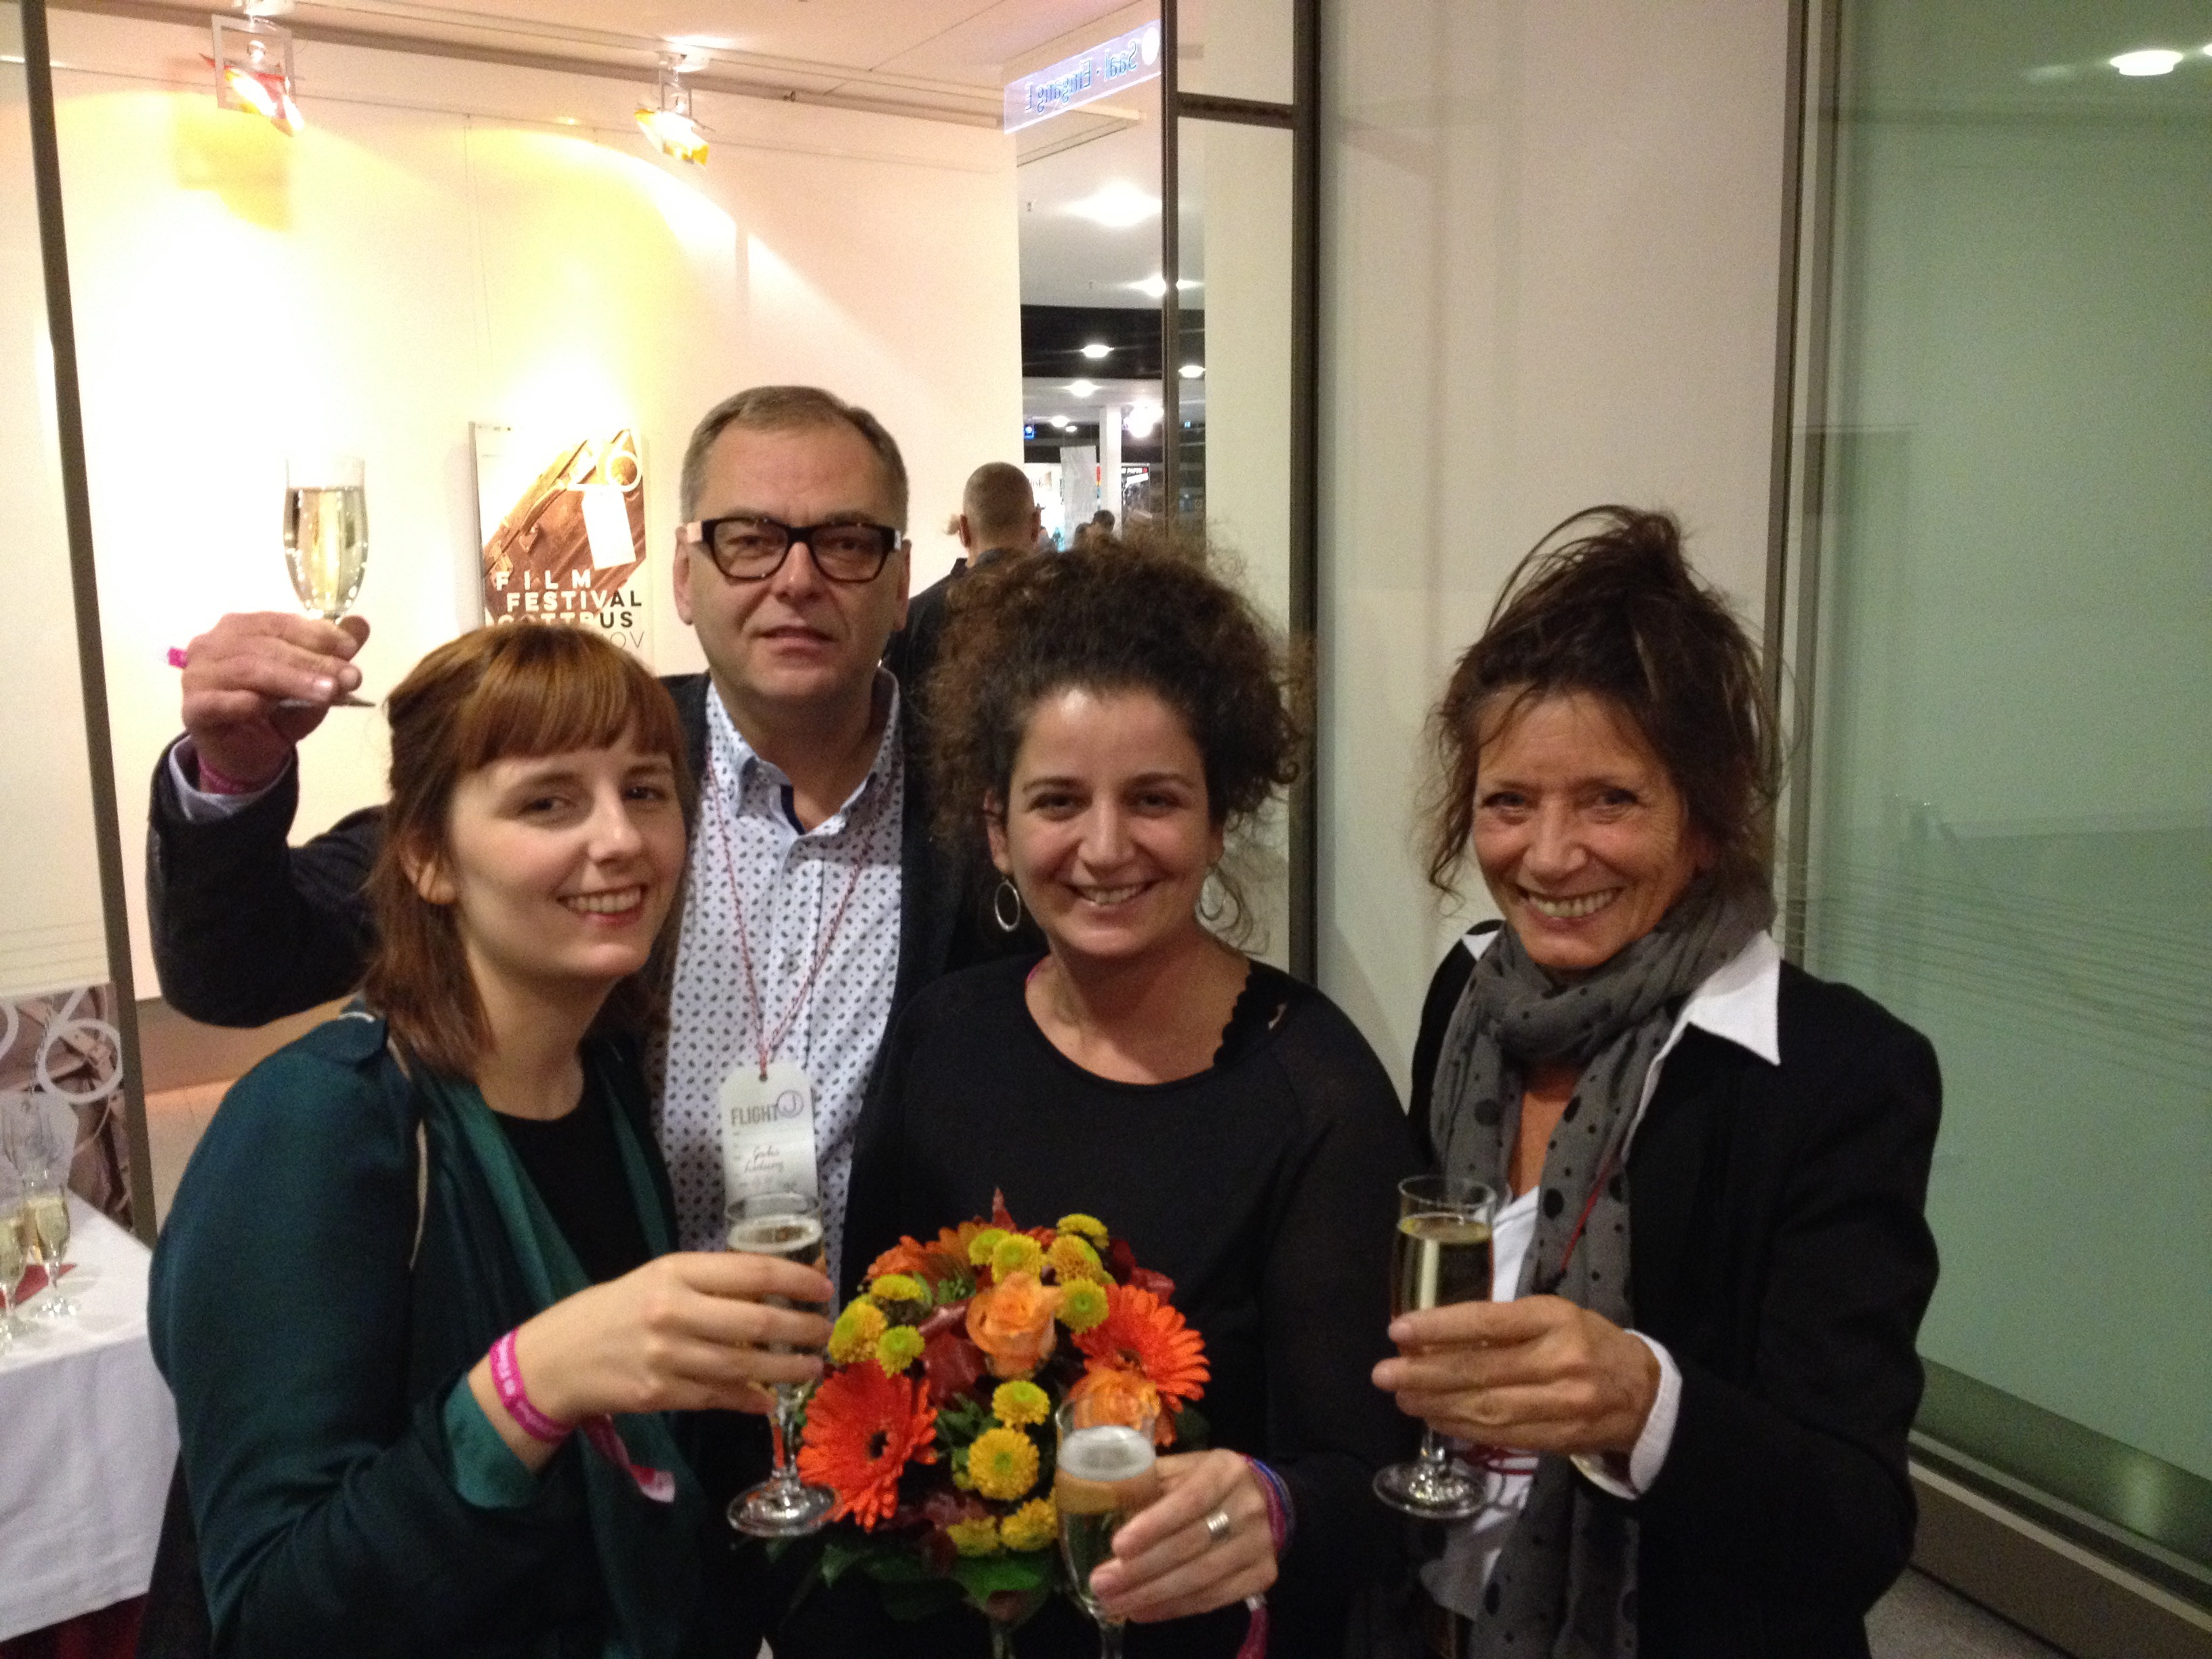 Judit Stalter, Produzentin, nahm den Preis unserer Jury entgegen, 3.v.l.